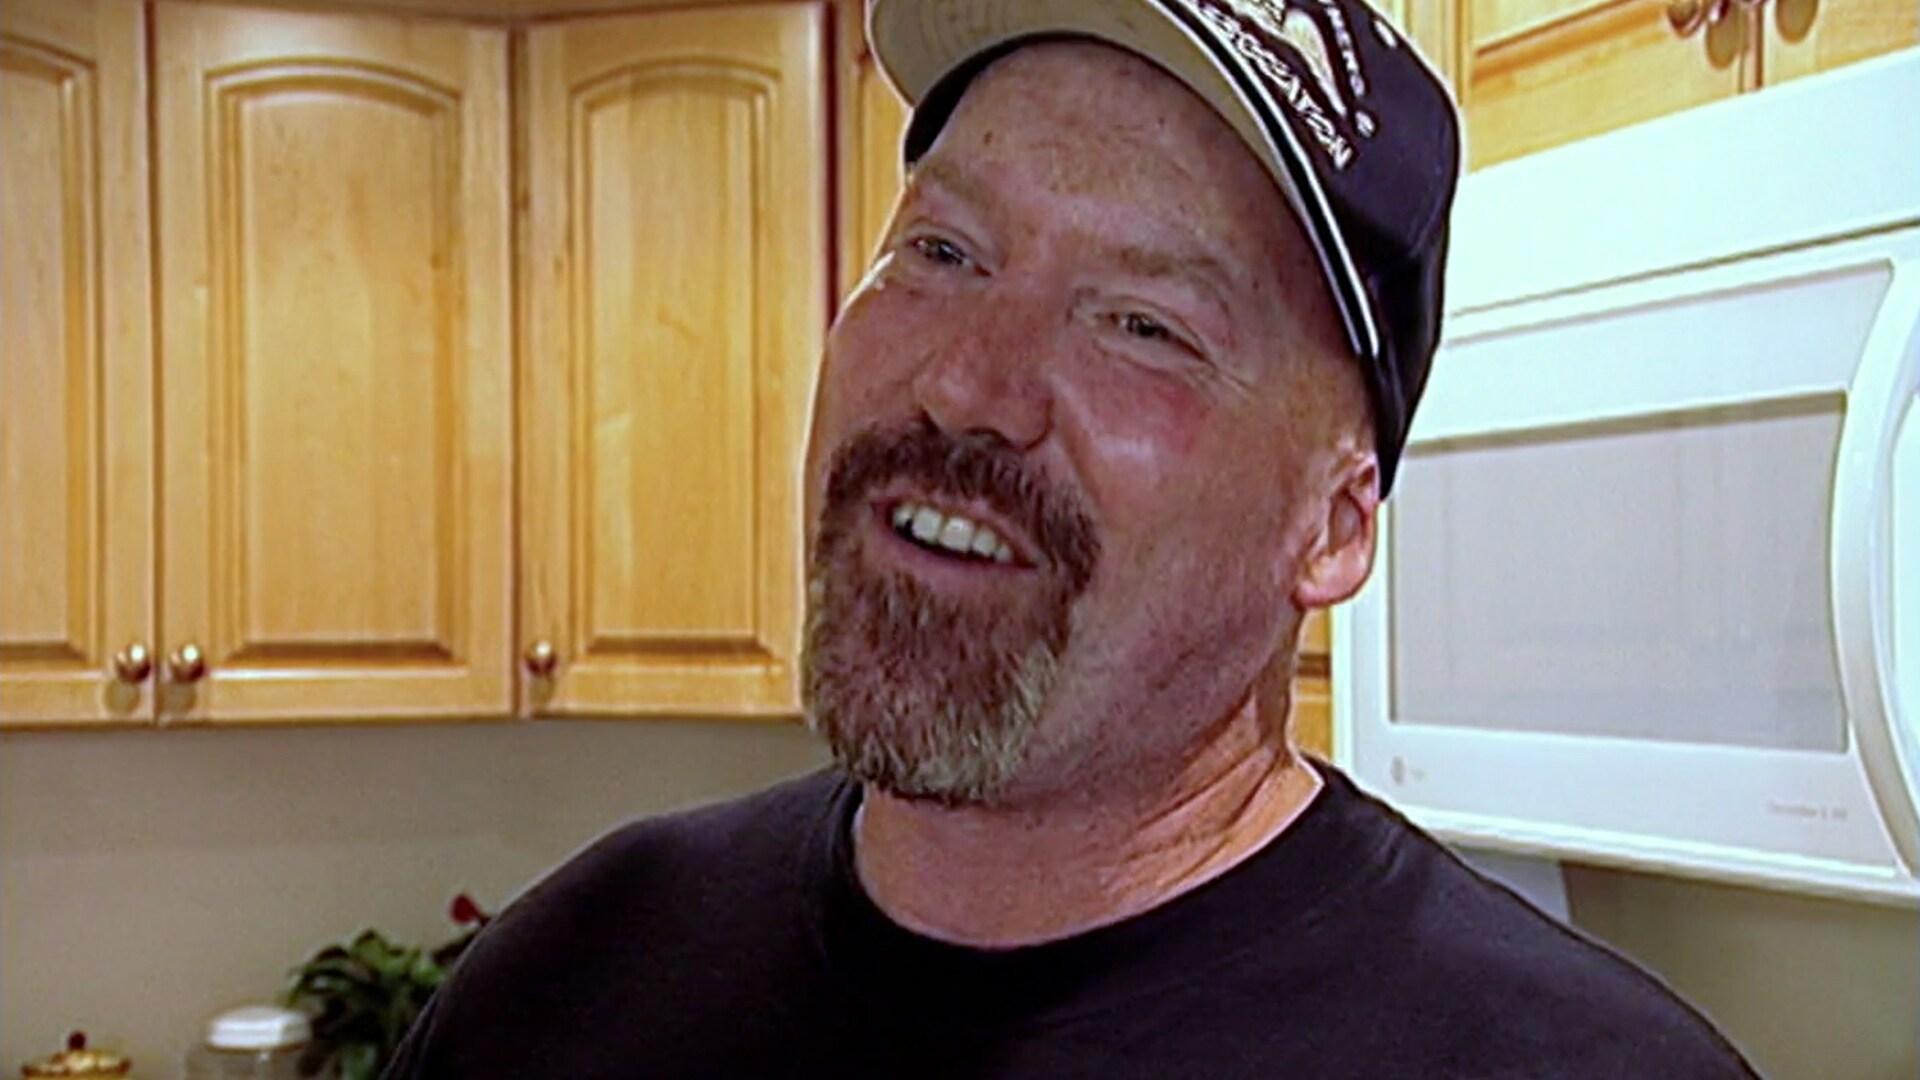 Help Fireman Thank His Heroes: Steve H.